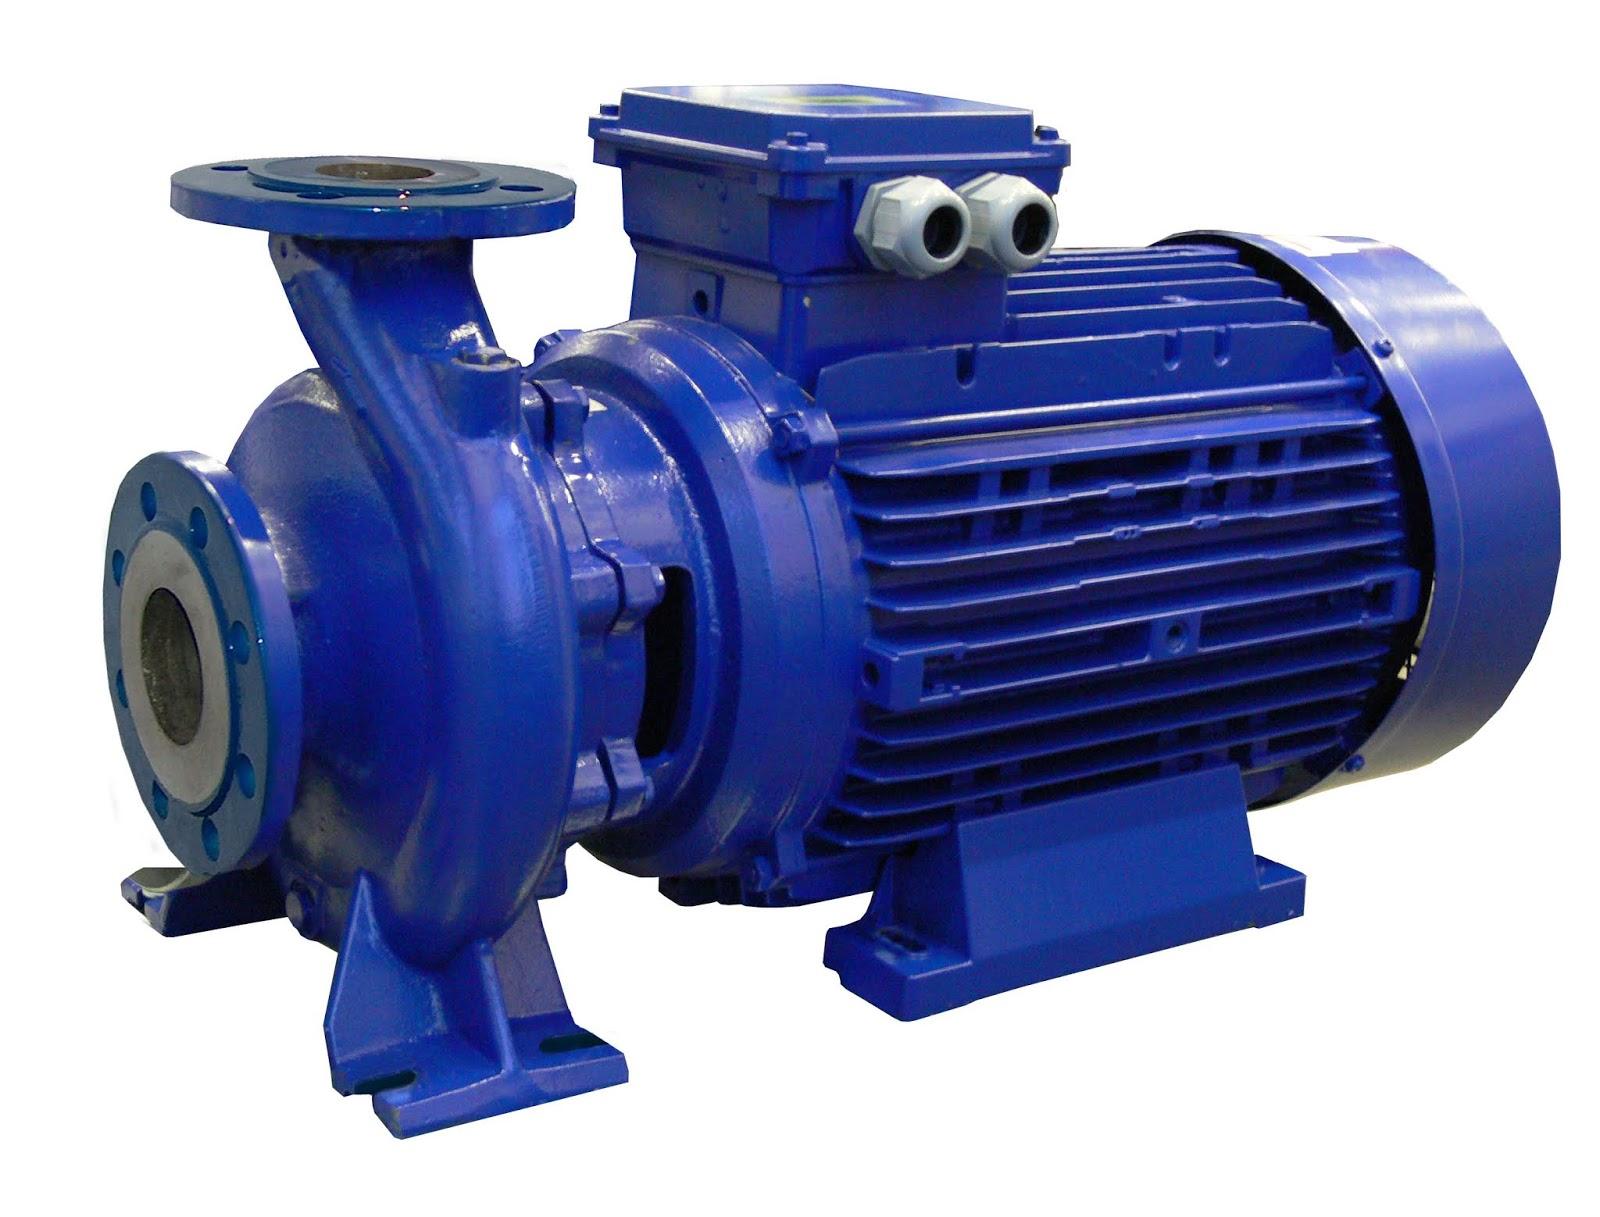 pompa odsrodkowa hydro vacuum mva - Jenis Jenis Pompa Di Atas Kapal